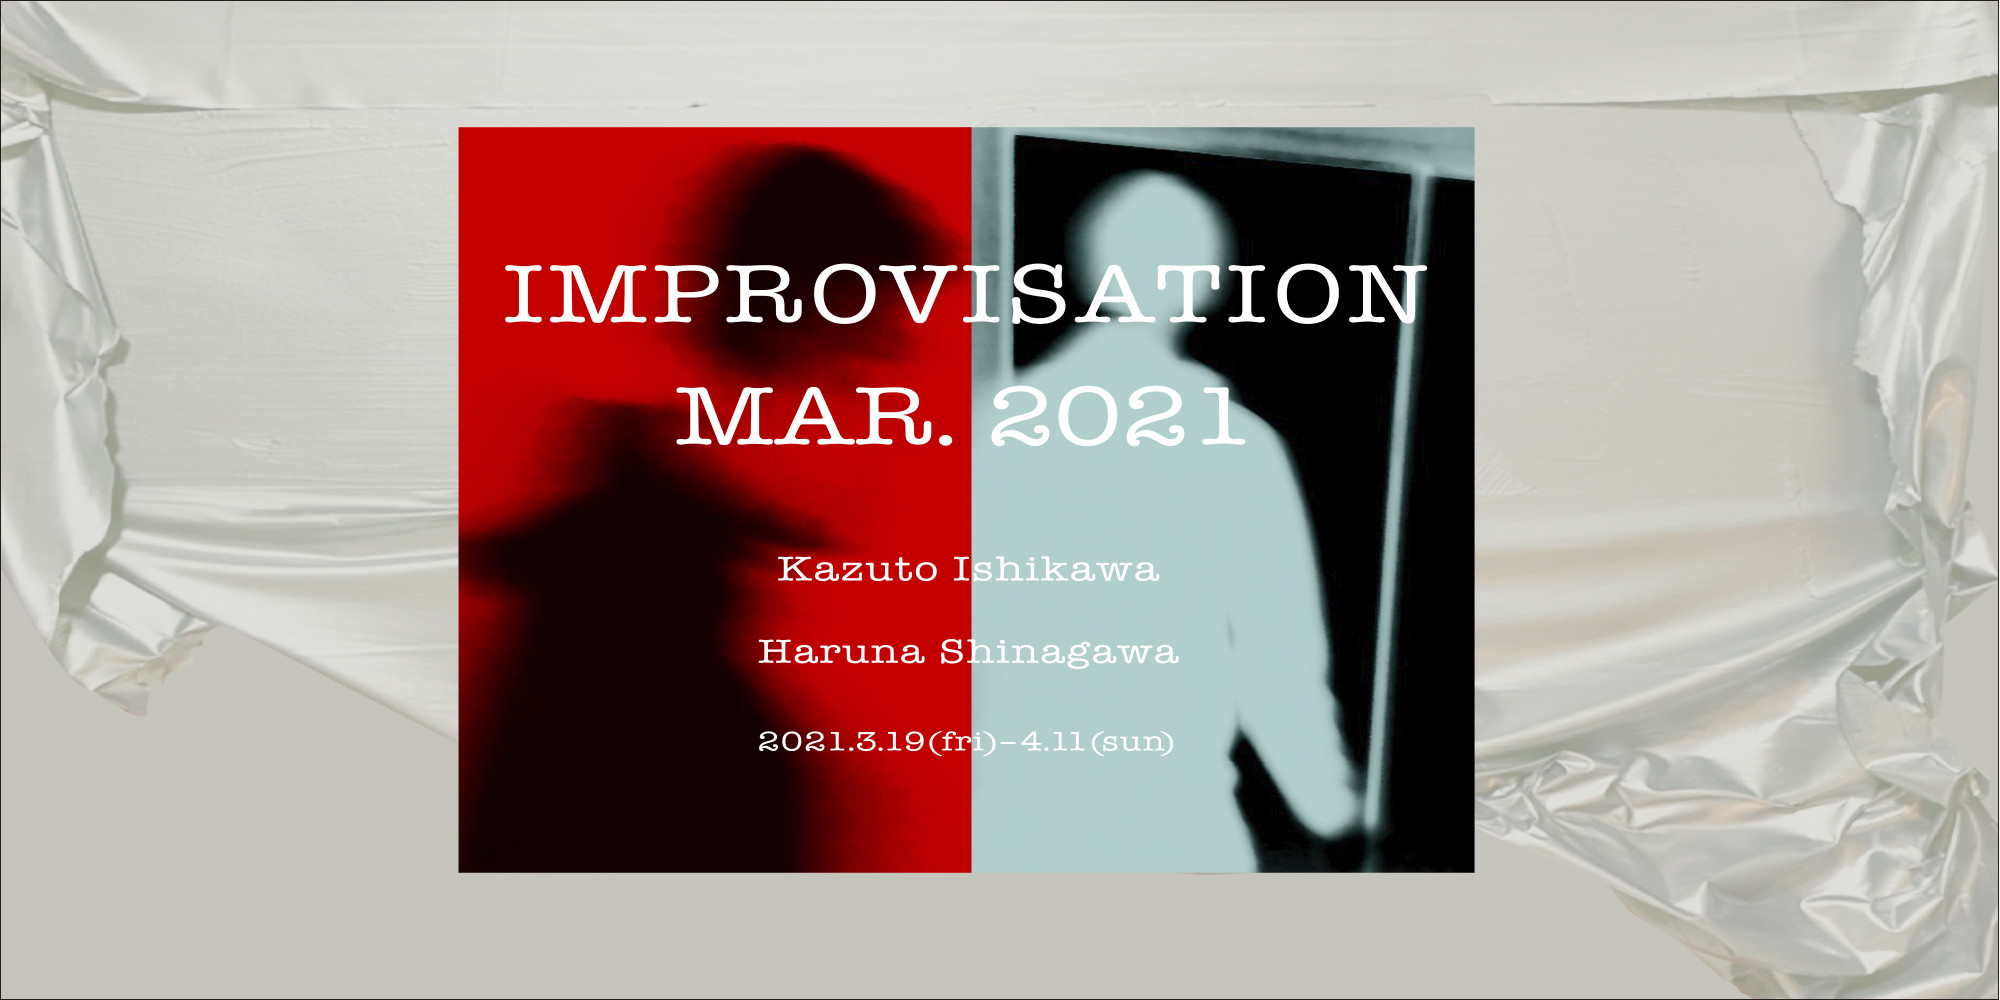 IMPROVISATION MAR. 2021